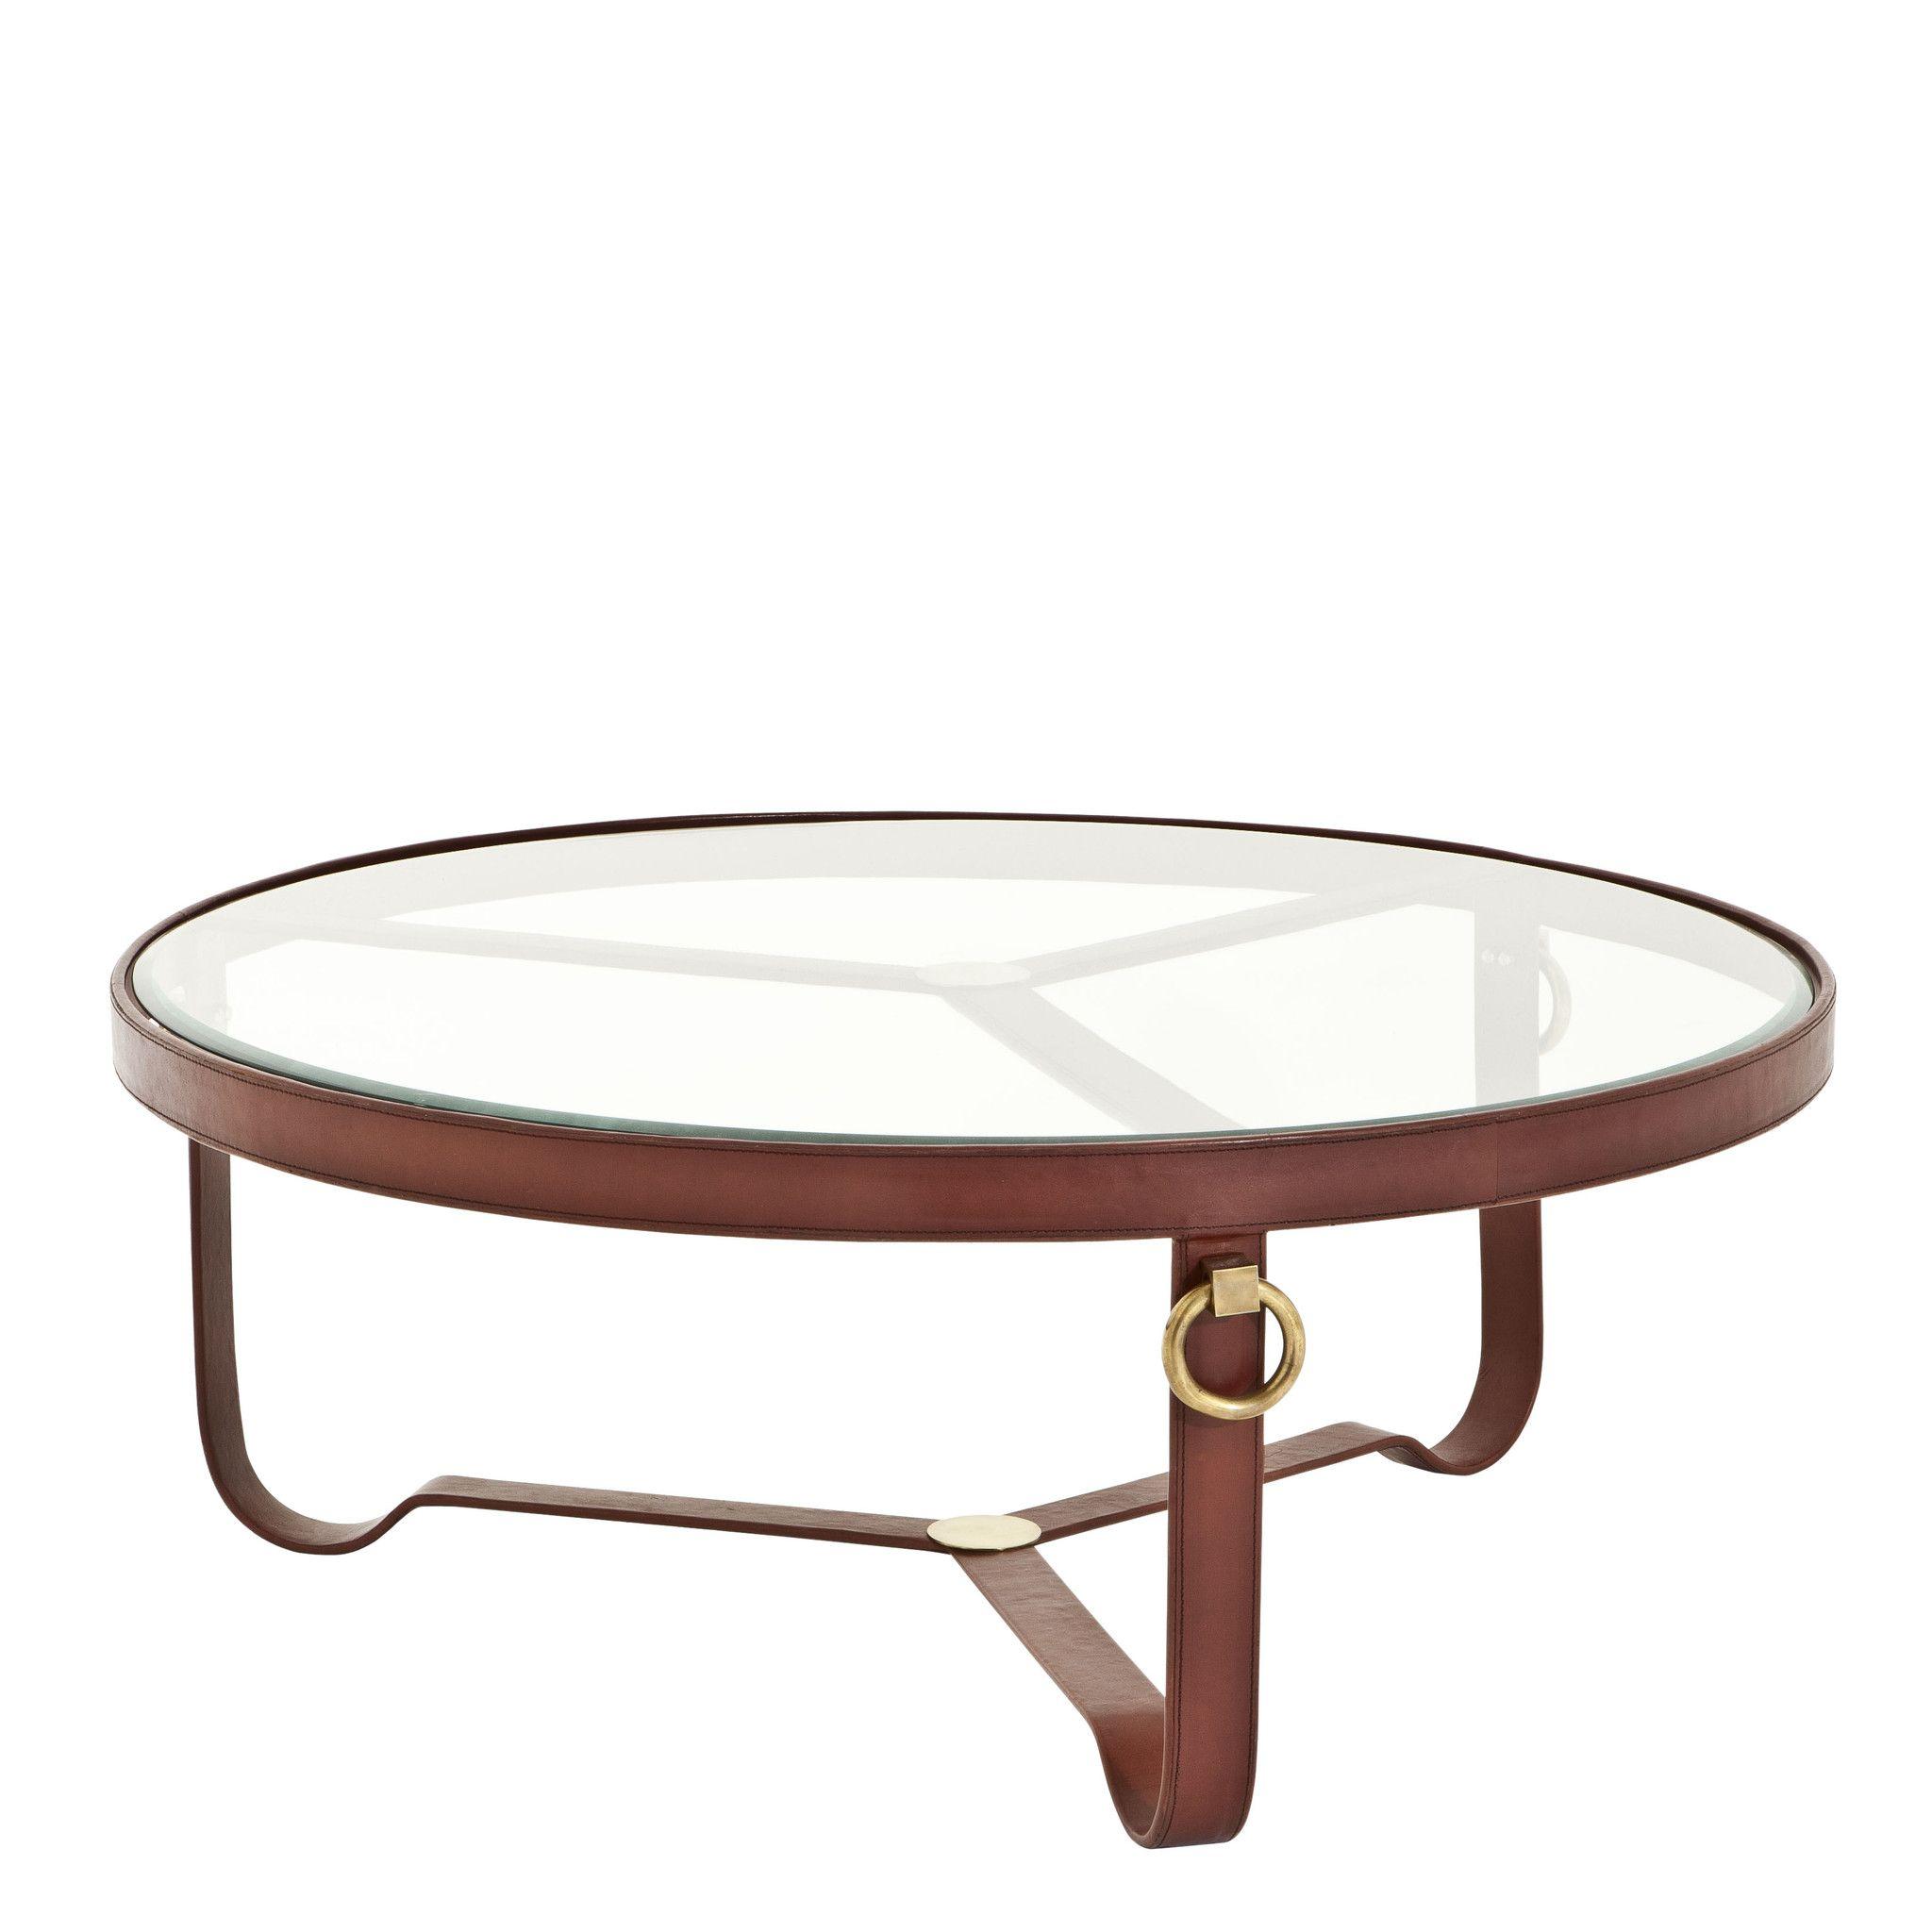 Round Coffee Table Eichholtz Belgravia In 2021 Round Coffee Table Coffee Table Glass Top Coffee Table [ 2048 x 2048 Pixel ]